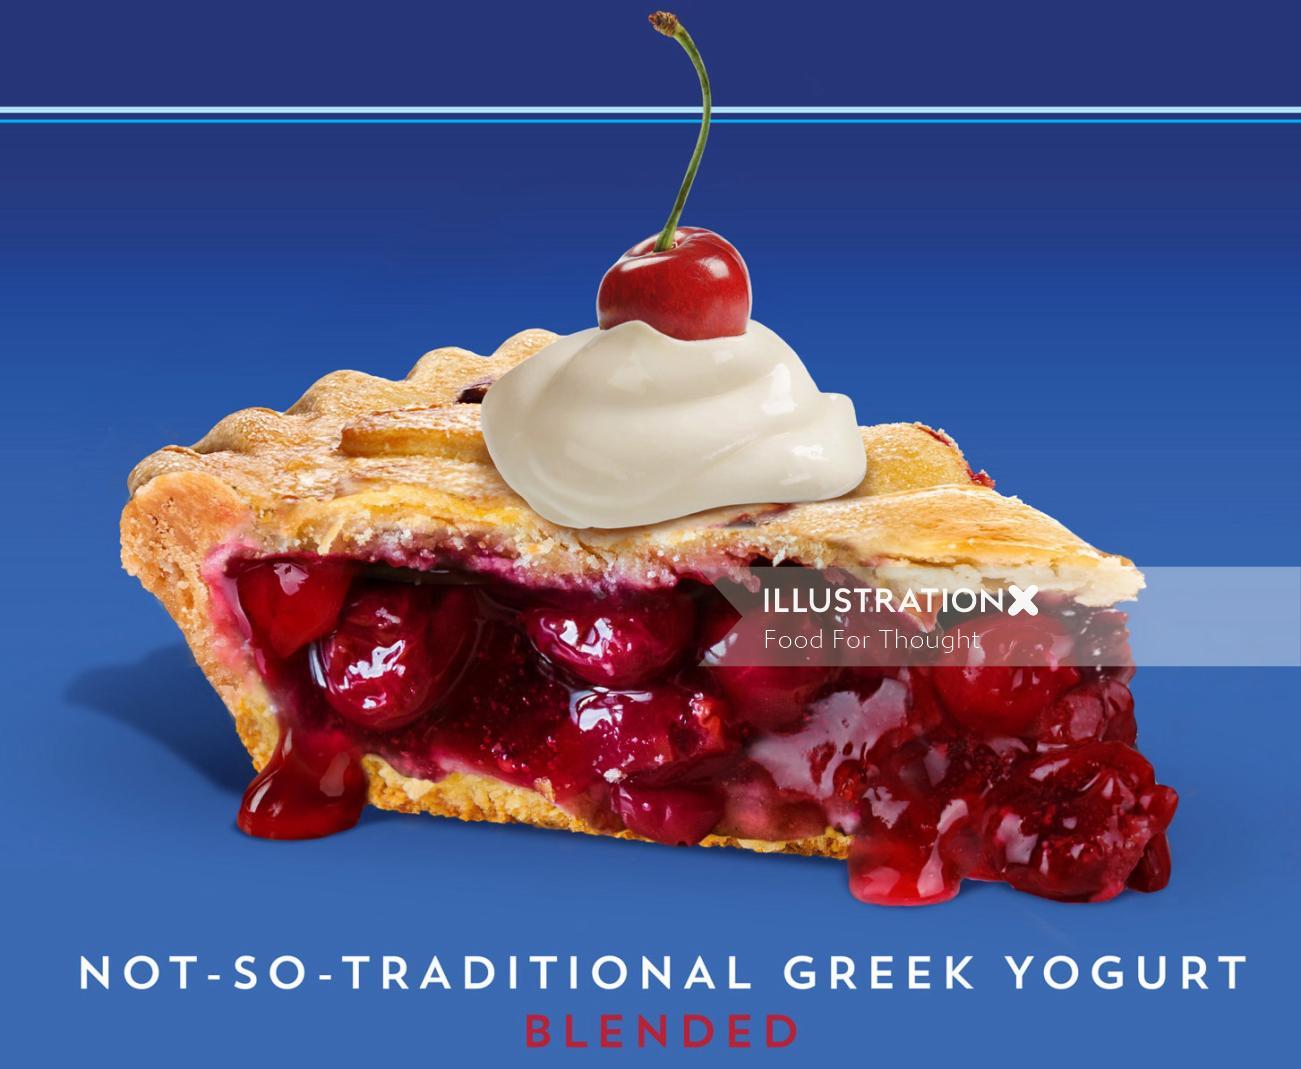 delicious Oikos luxury yogurt